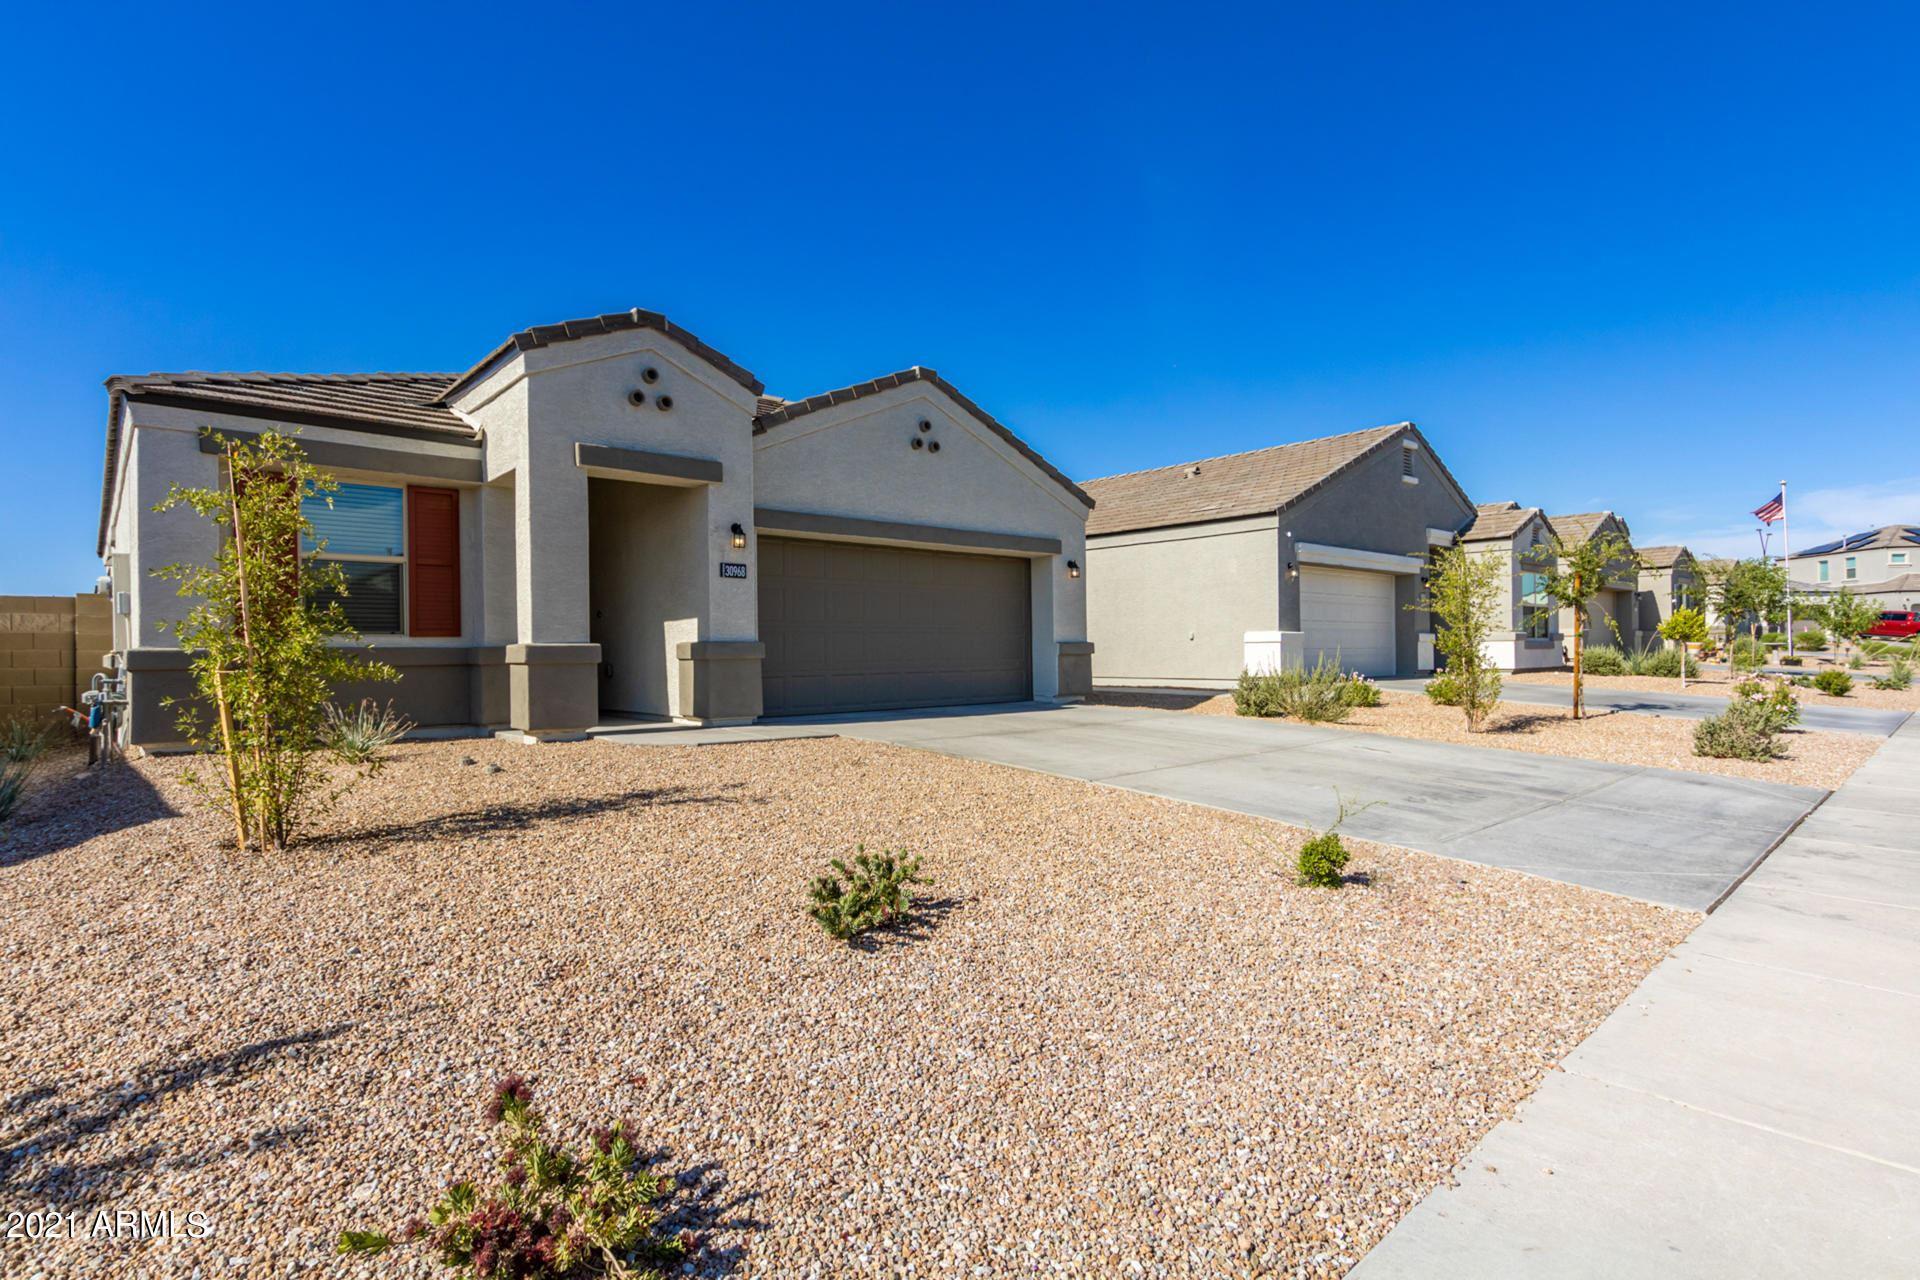 Photo of 30968 W MITCHELL Drive, Buckeye, AZ 85396 (MLS # 6249991)